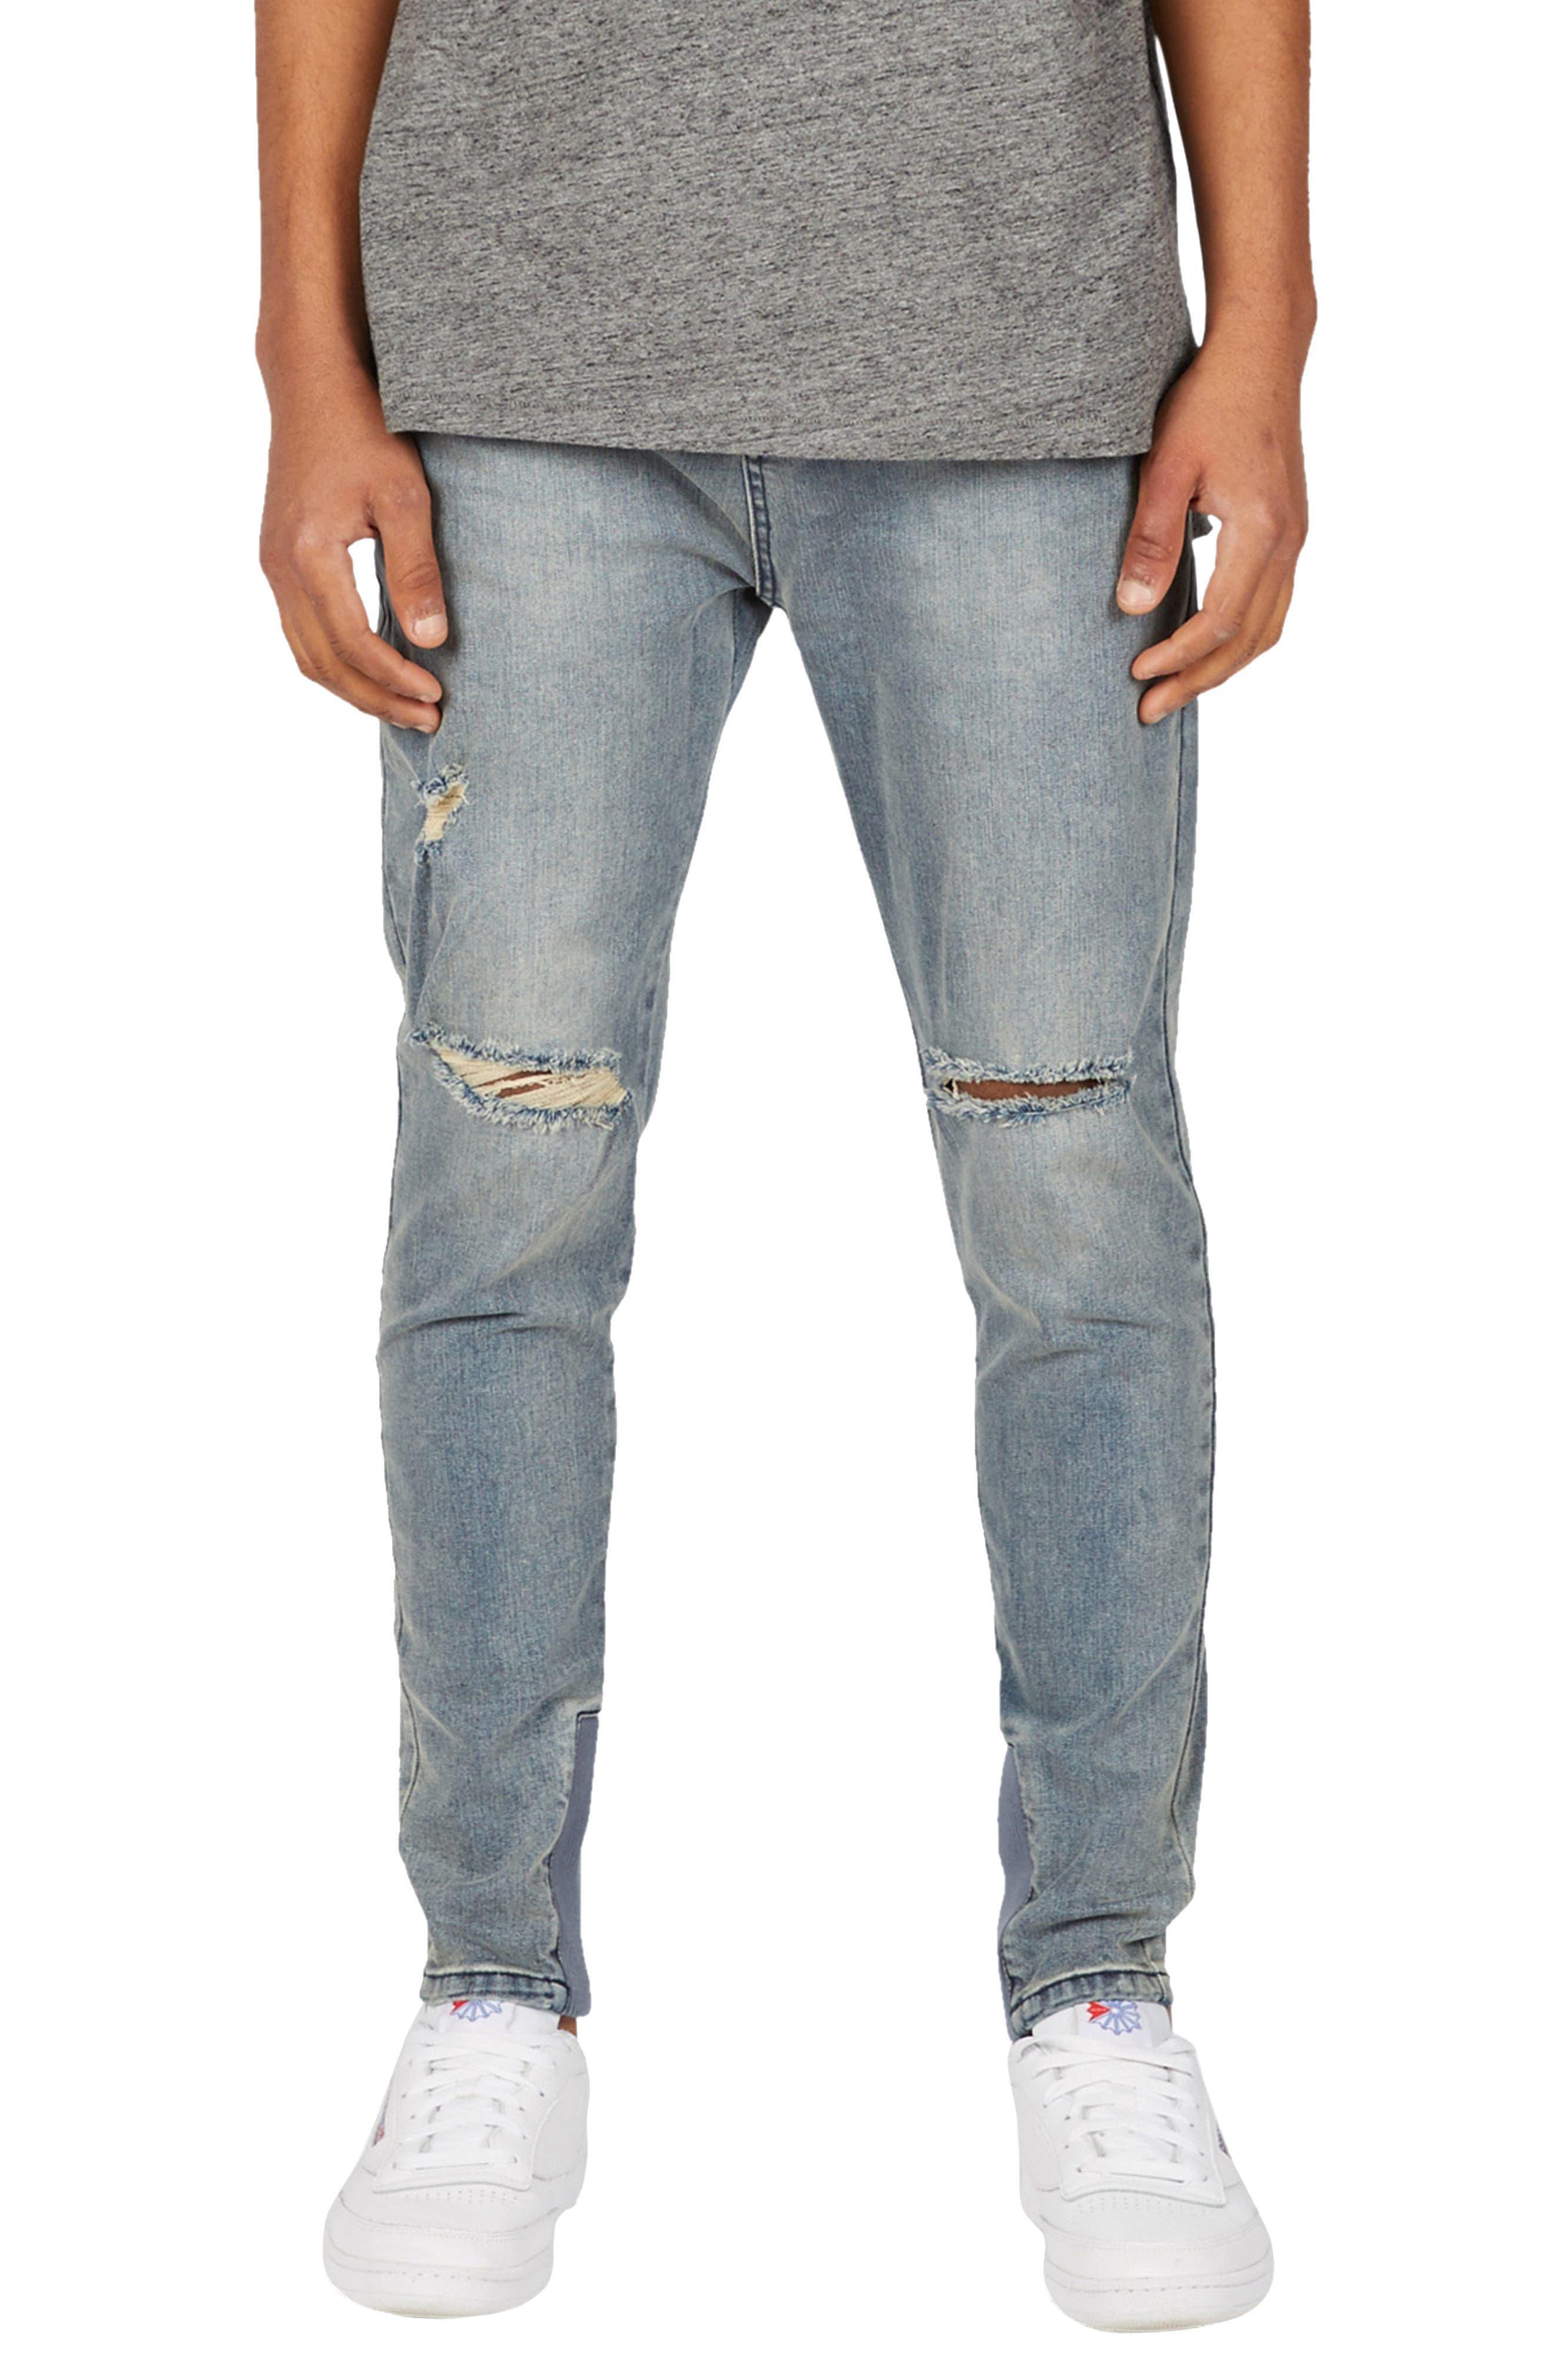 Sharpshot Slouchy Slim Fit Jeans,                         Main,                         color, Double Indigo